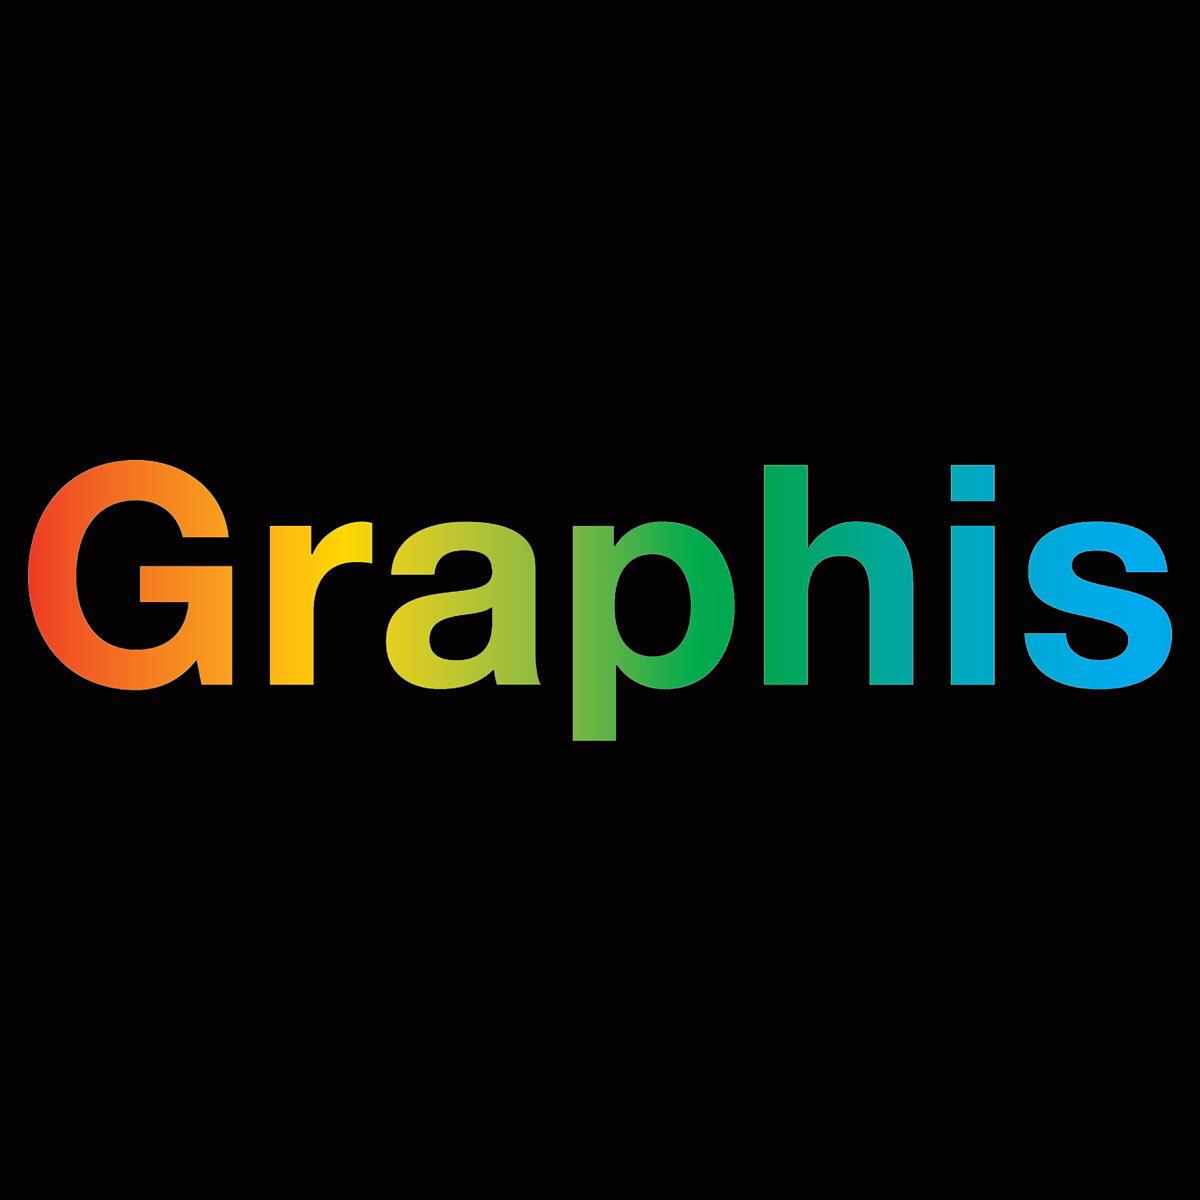 graphis logo design 9 call for entries